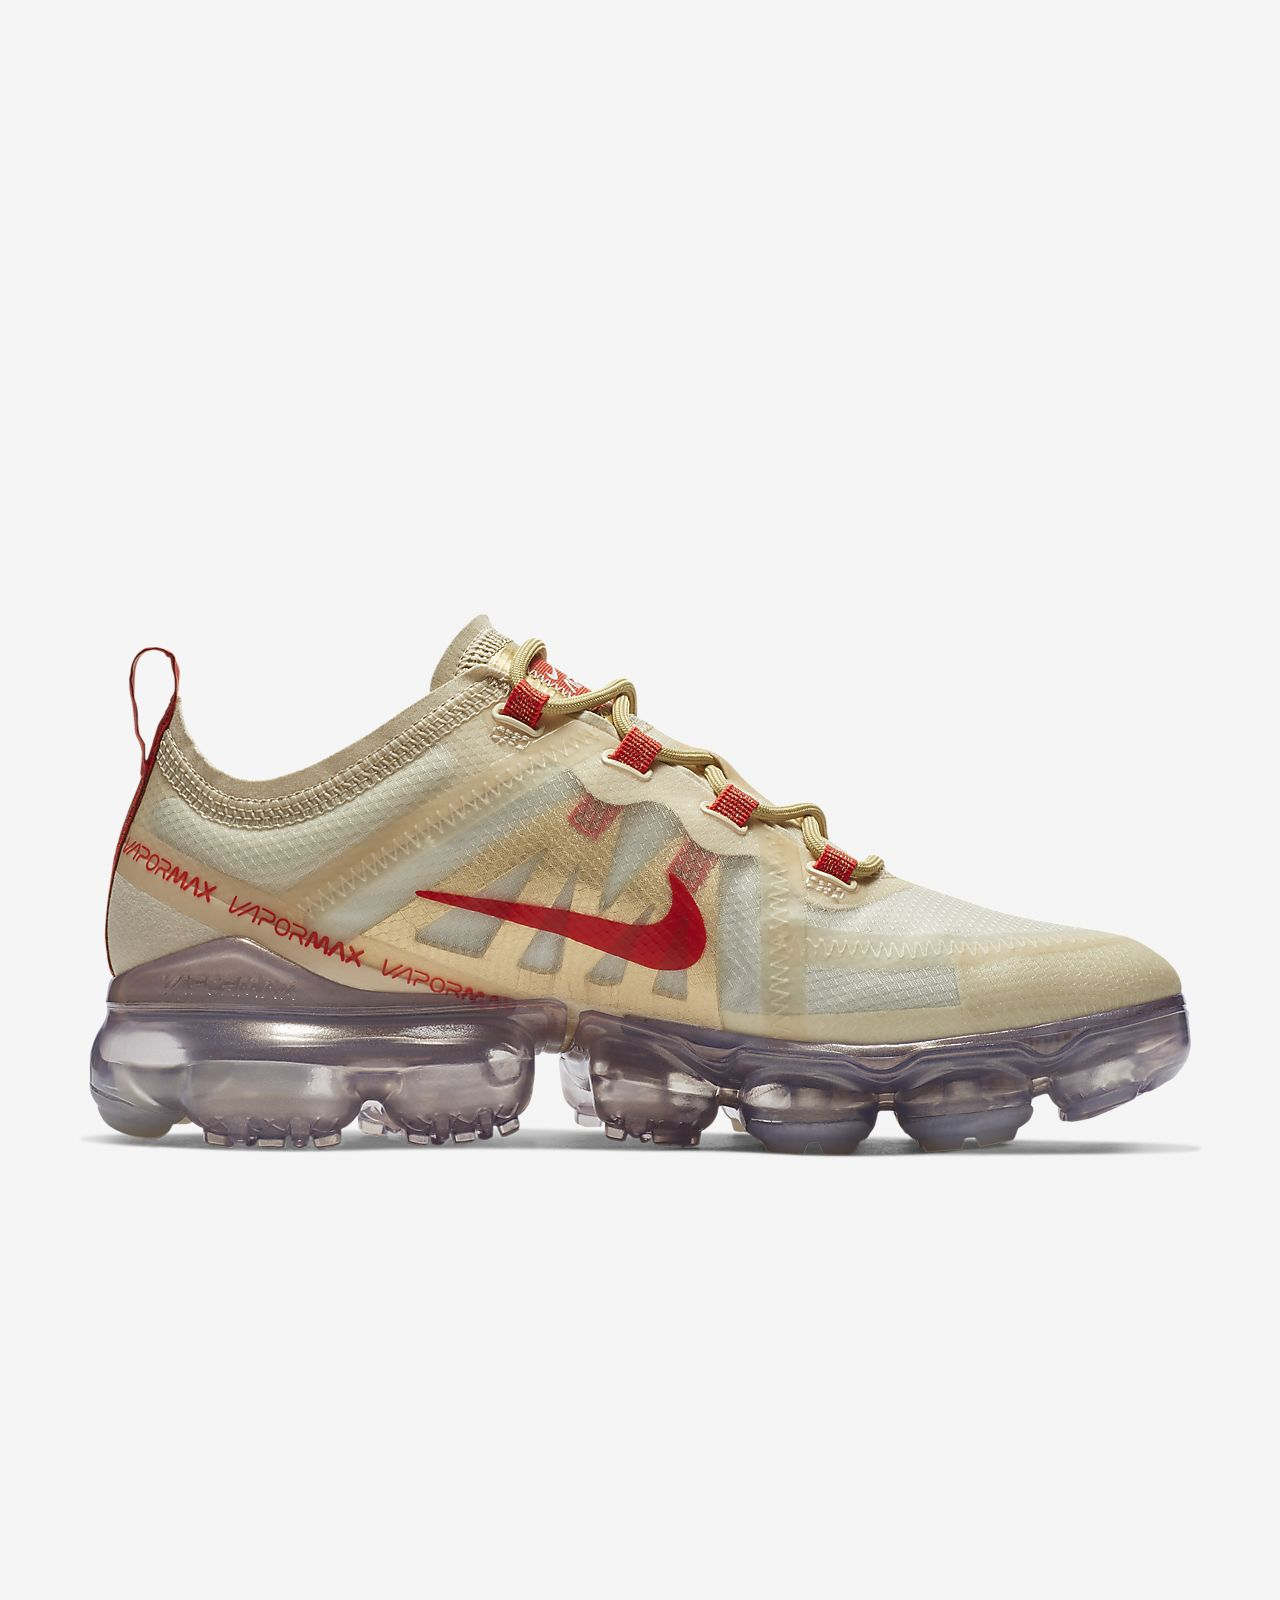 6eb106c5471e9 Nike Air VaporMax 2019 CNY Women s Shoe. Nike.com GB